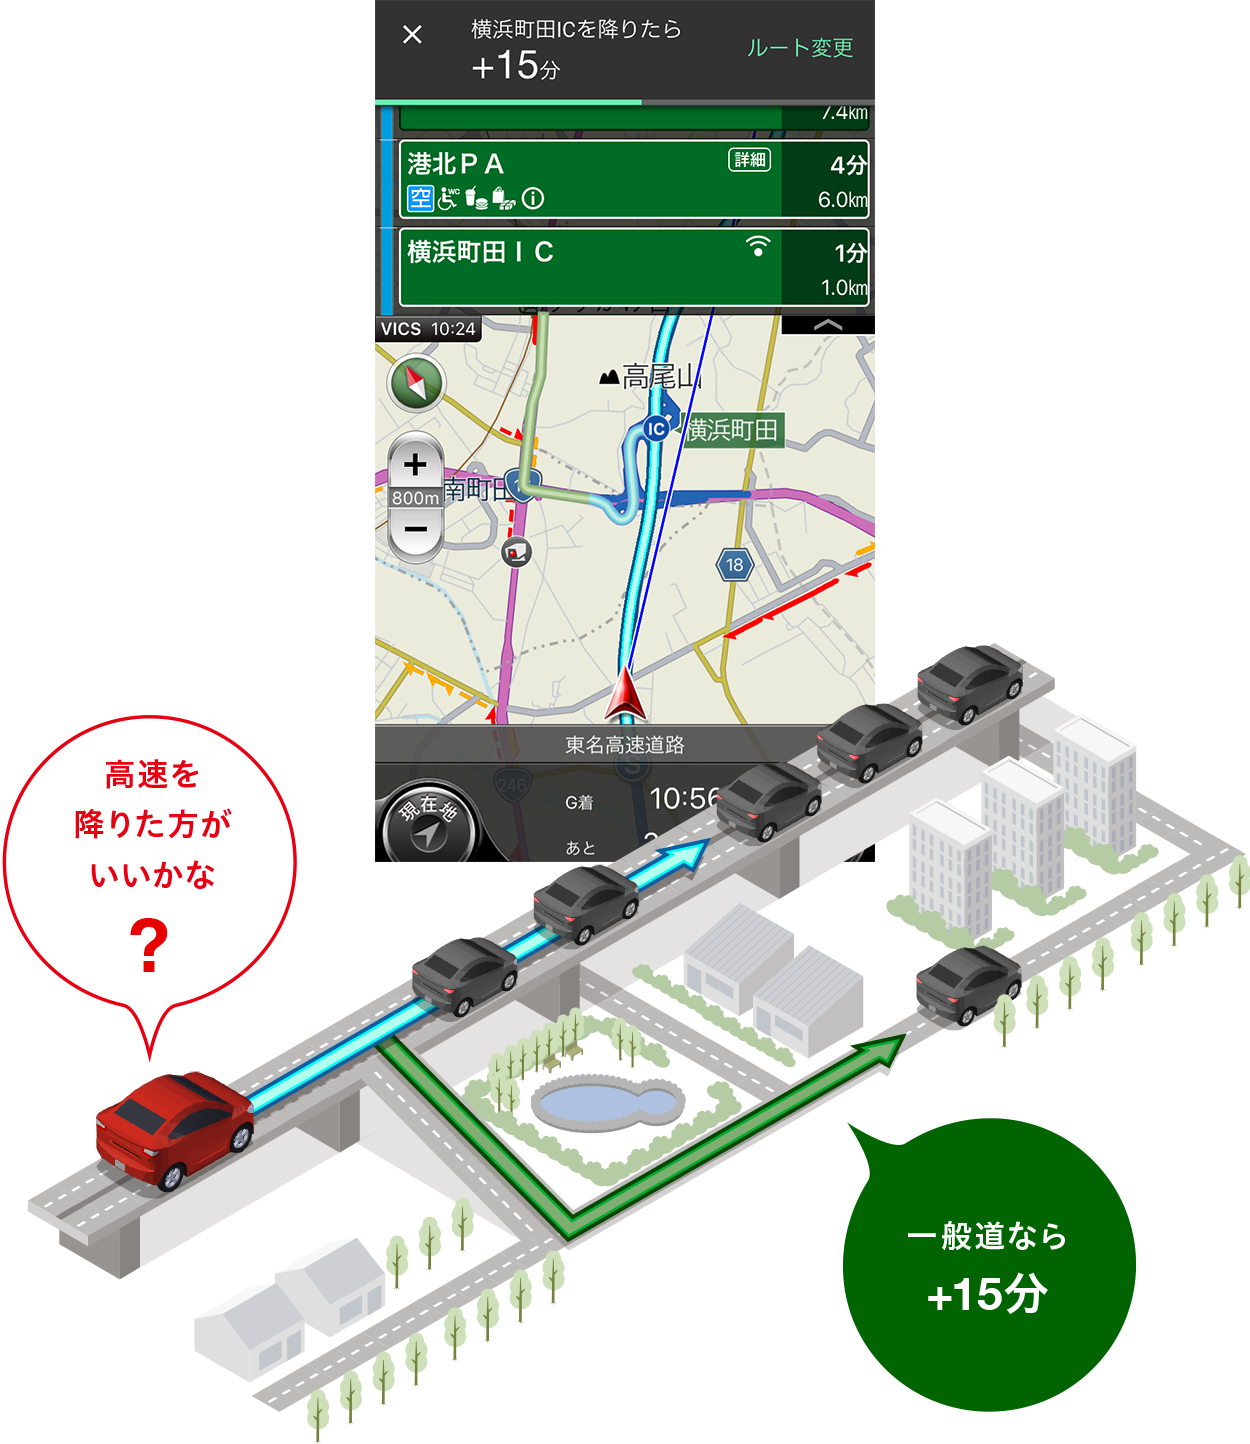 http://corporate.navitime.co.jp/topics/img_press_cnsp_ic_web.png